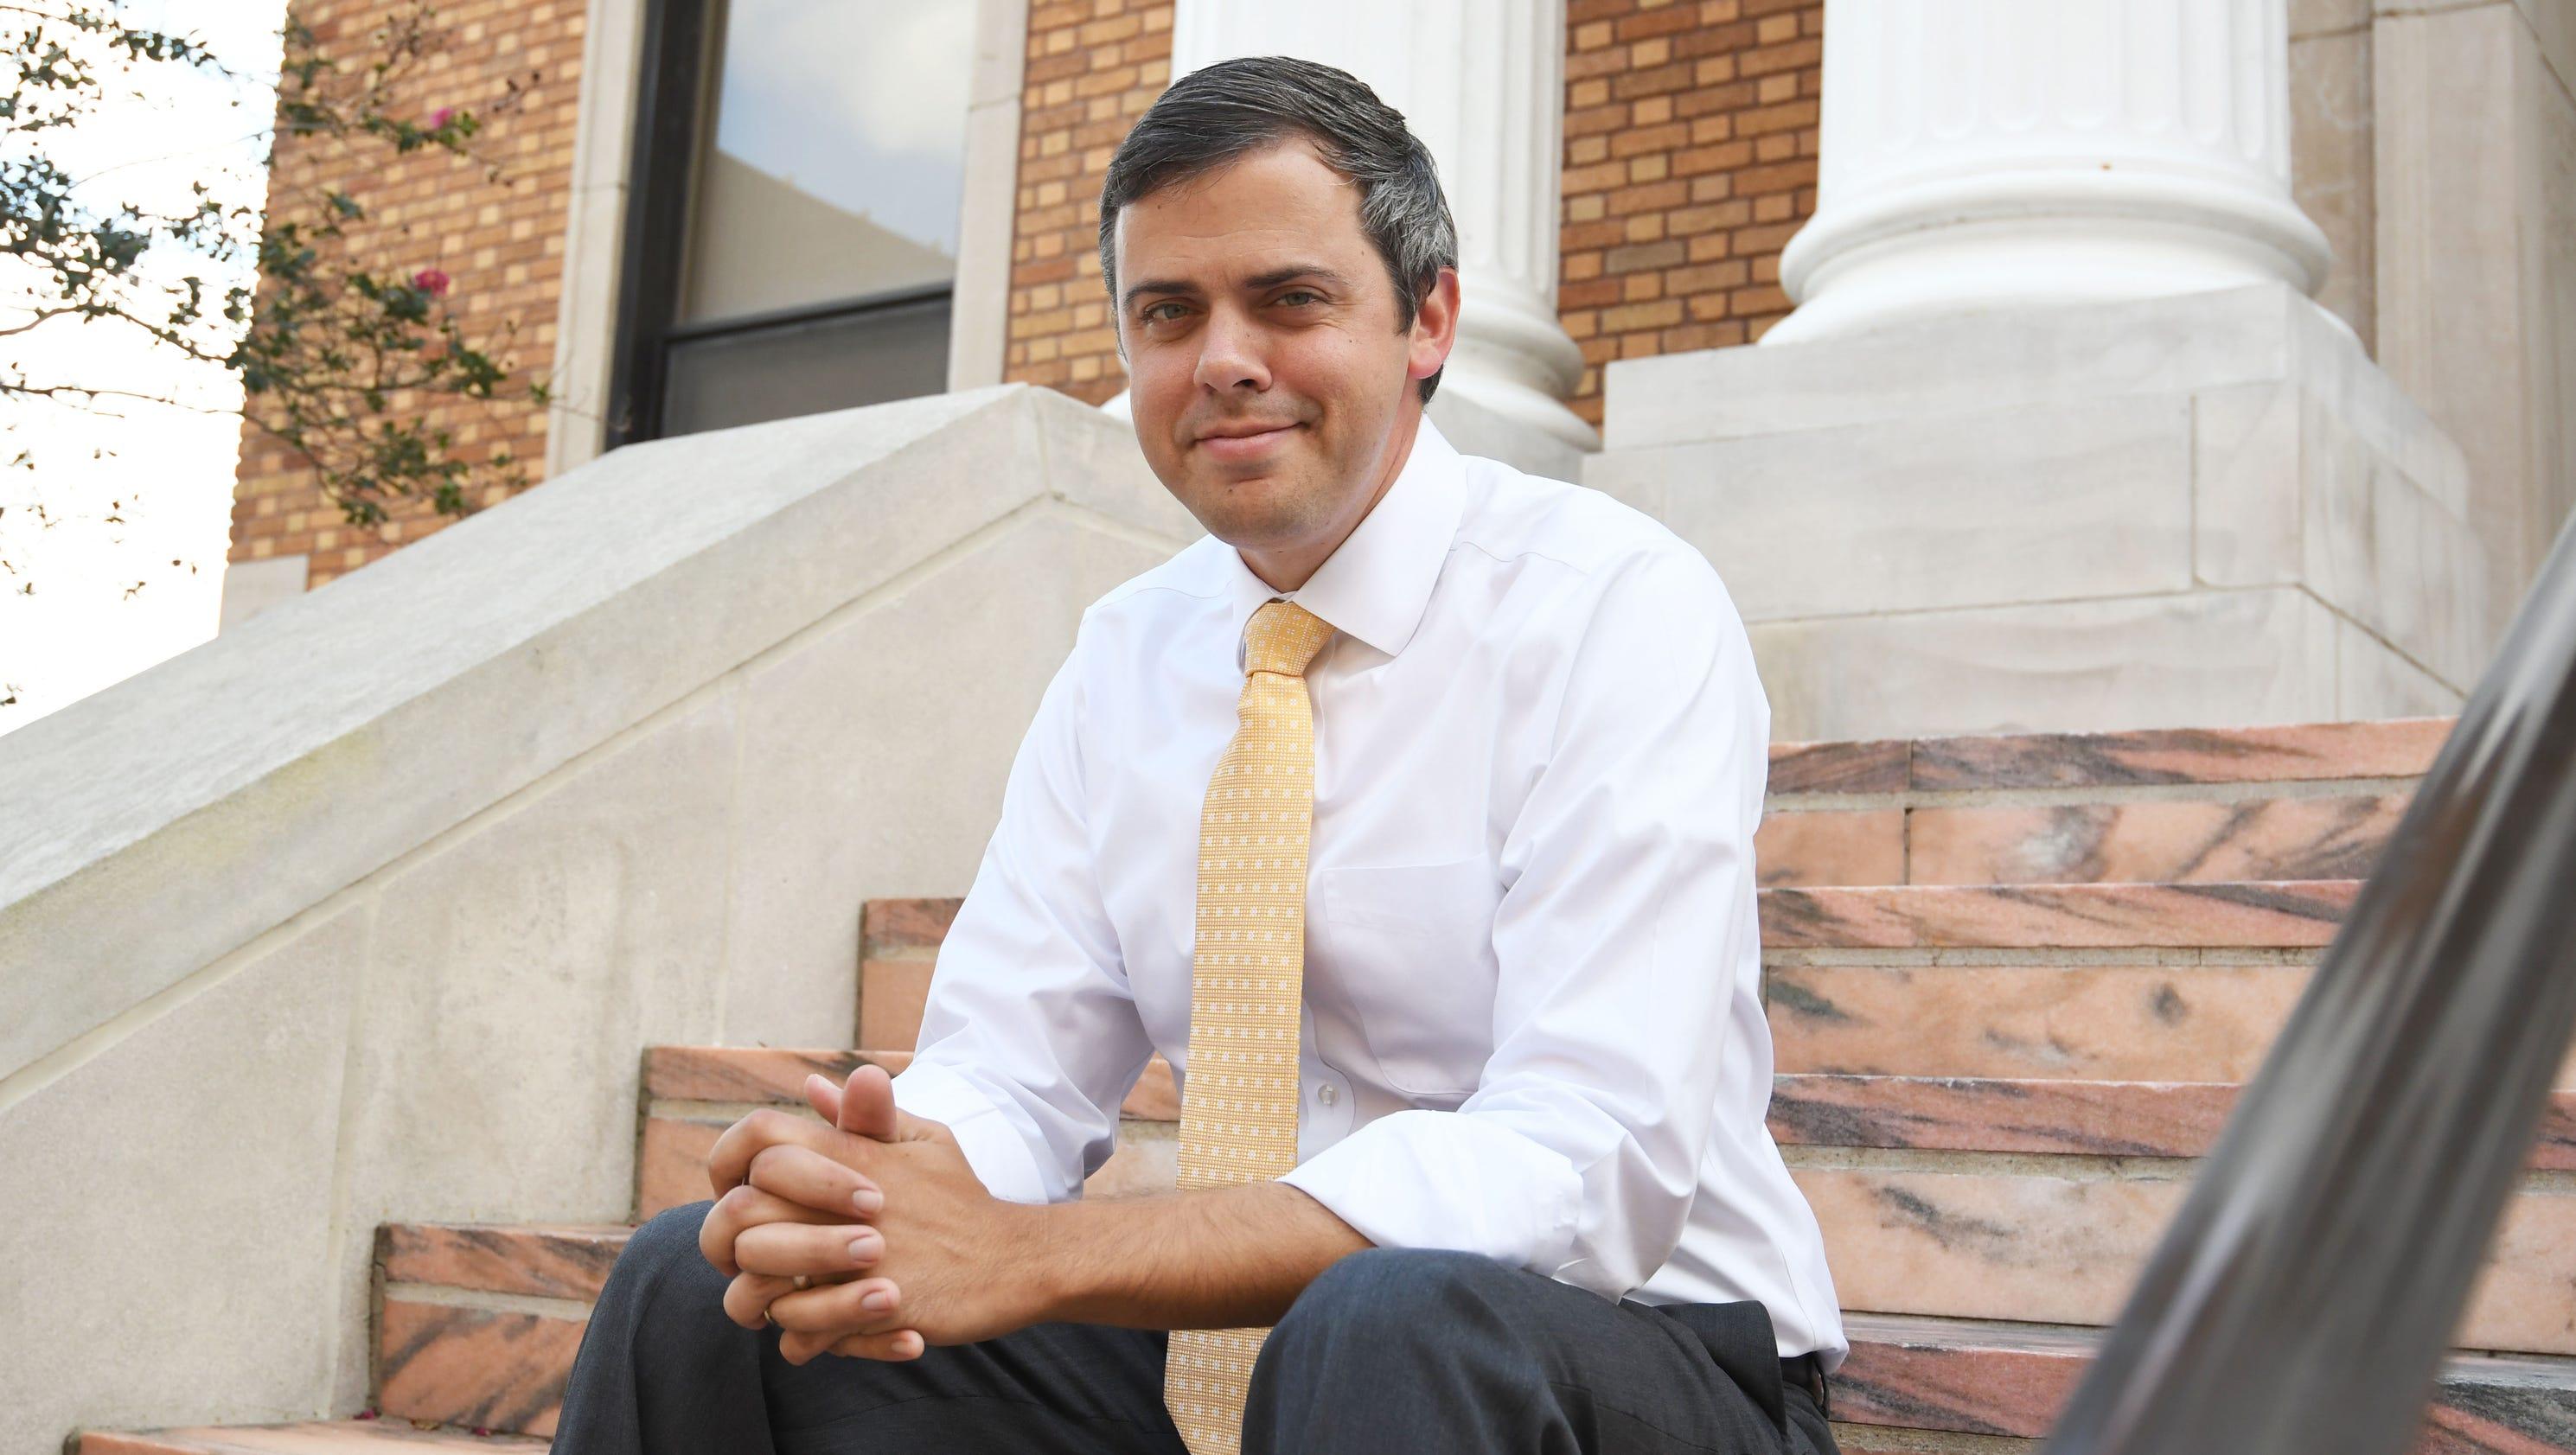 Hattiesburg Mayor Toby Barker first four months in office